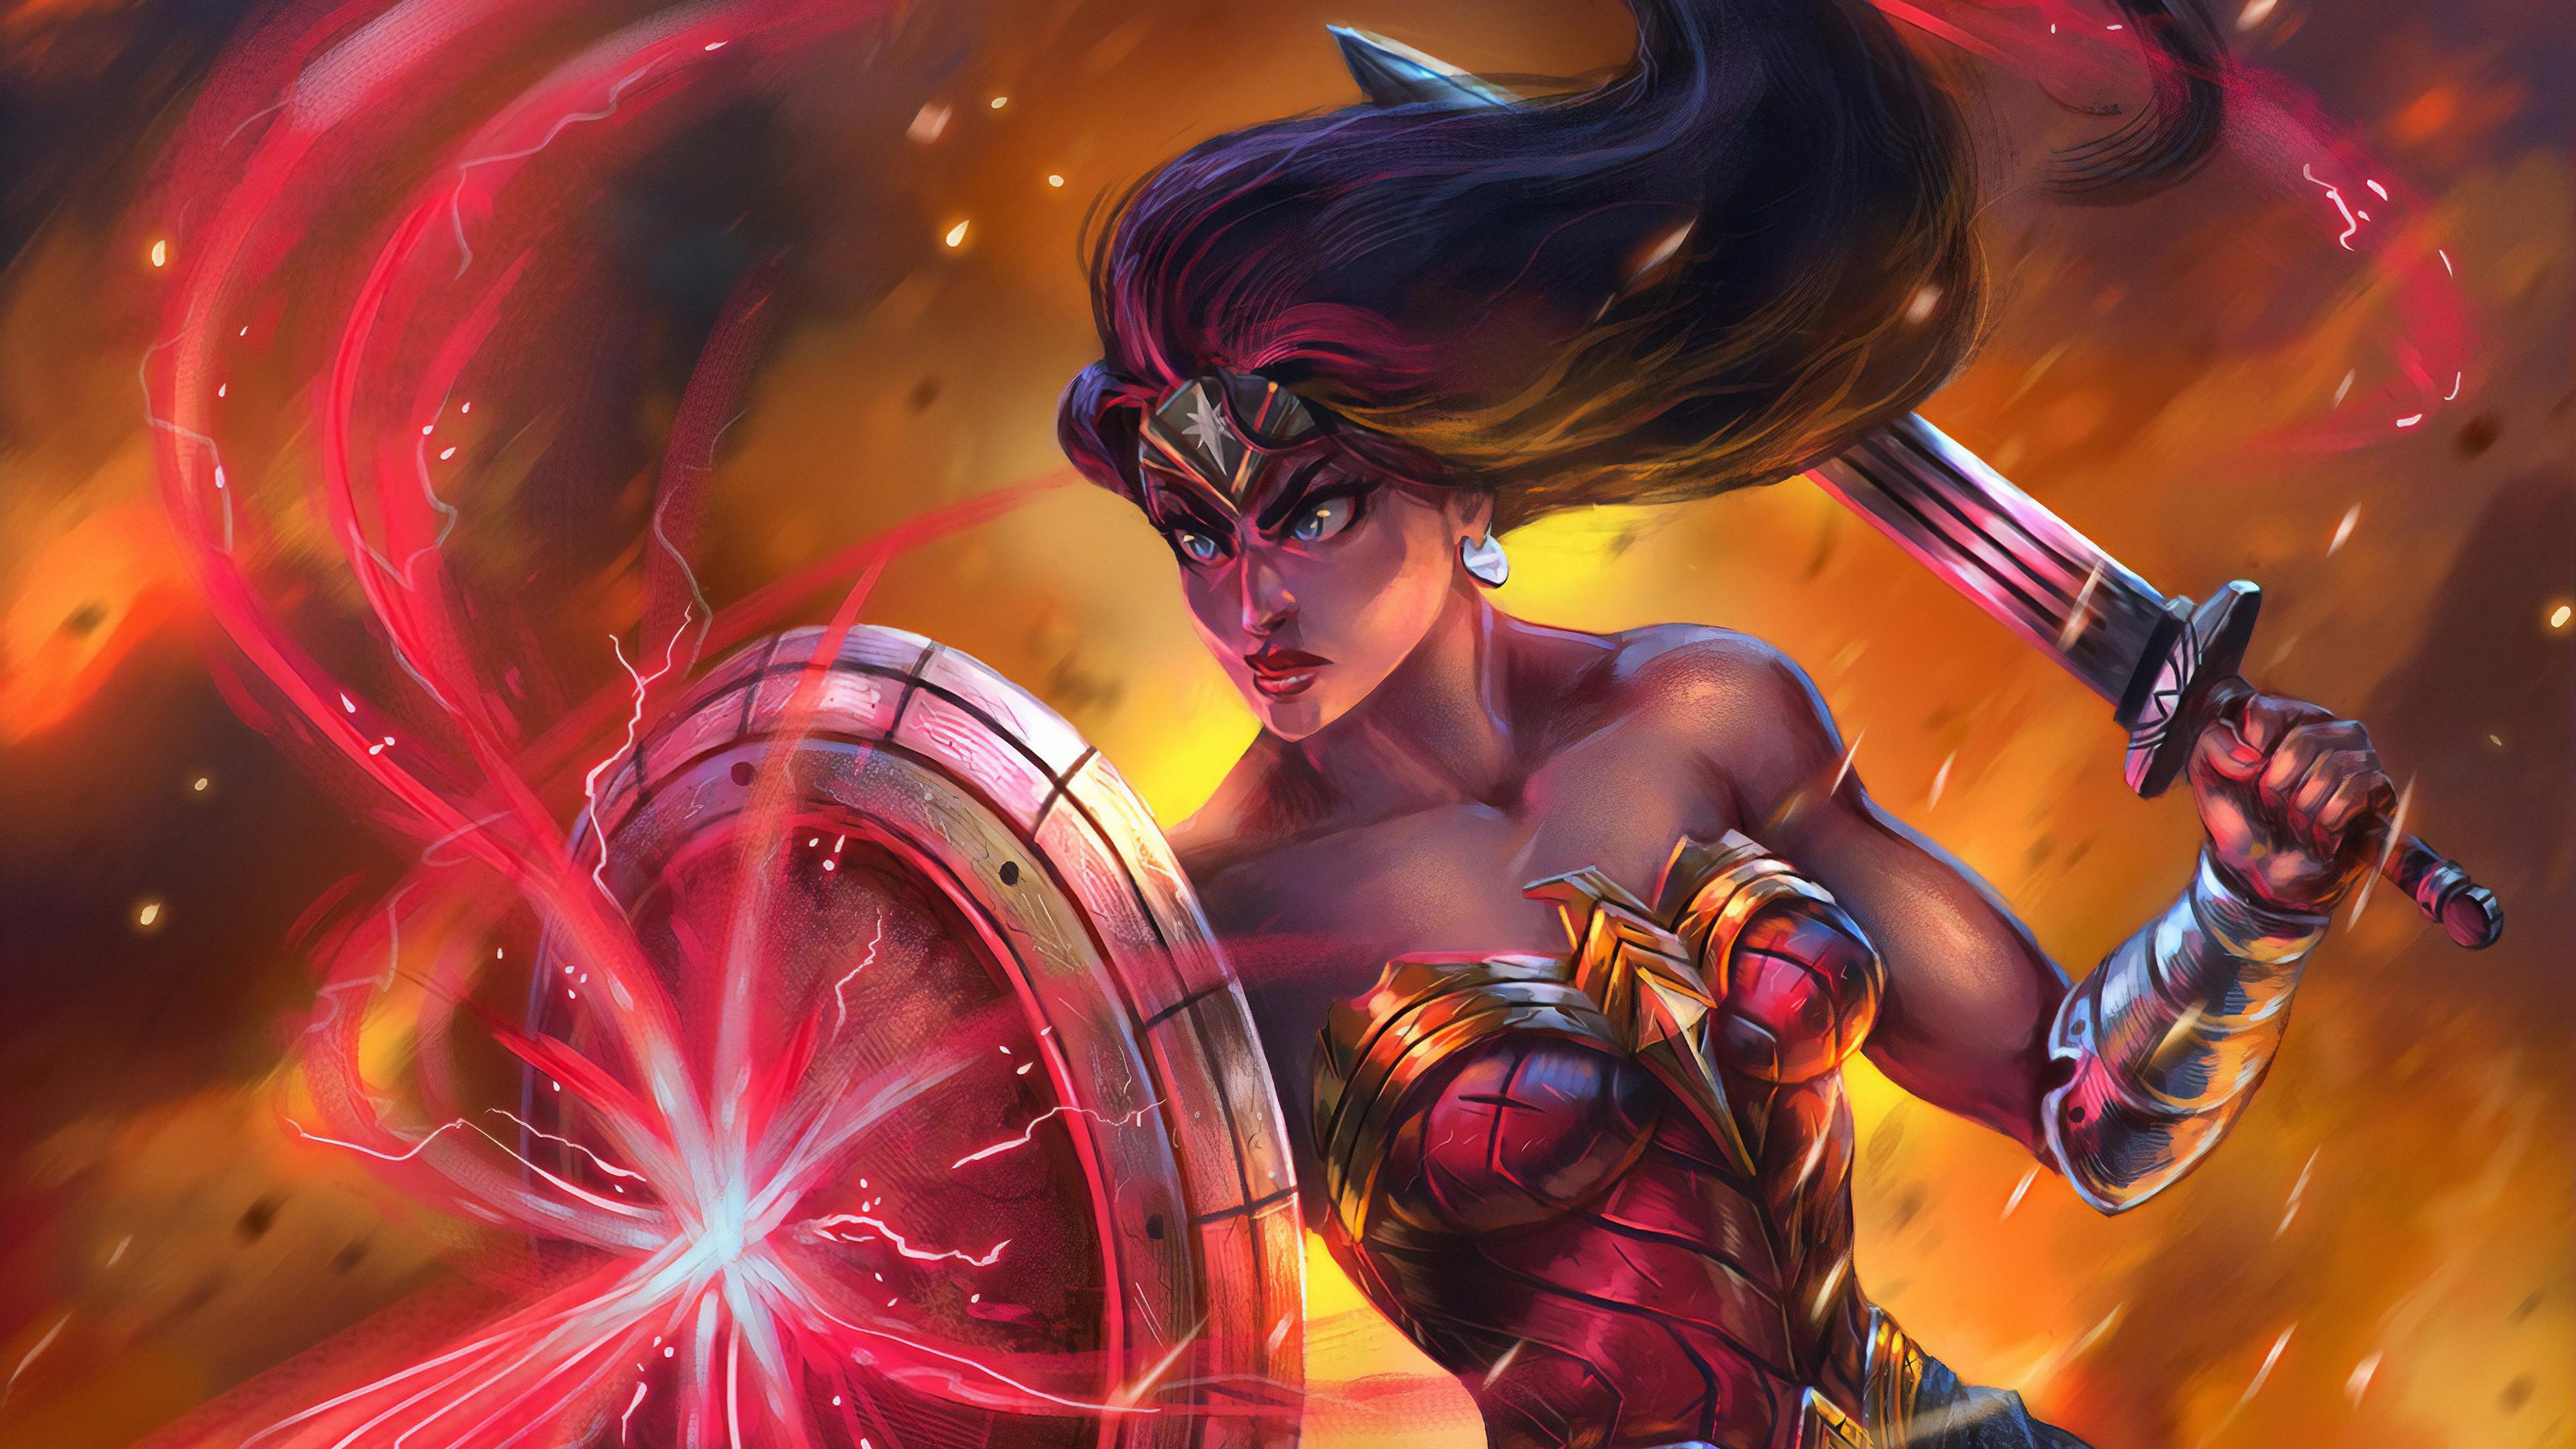 wonder woman about to ready 1570394737 - Wonder Woman About To Ready - wonder woman wallpapers, superheroes wallpapers, hd-wallpapers, digital art wallpapers, artwork wallpapers, artstation wallpapers, 4k-wallpapers